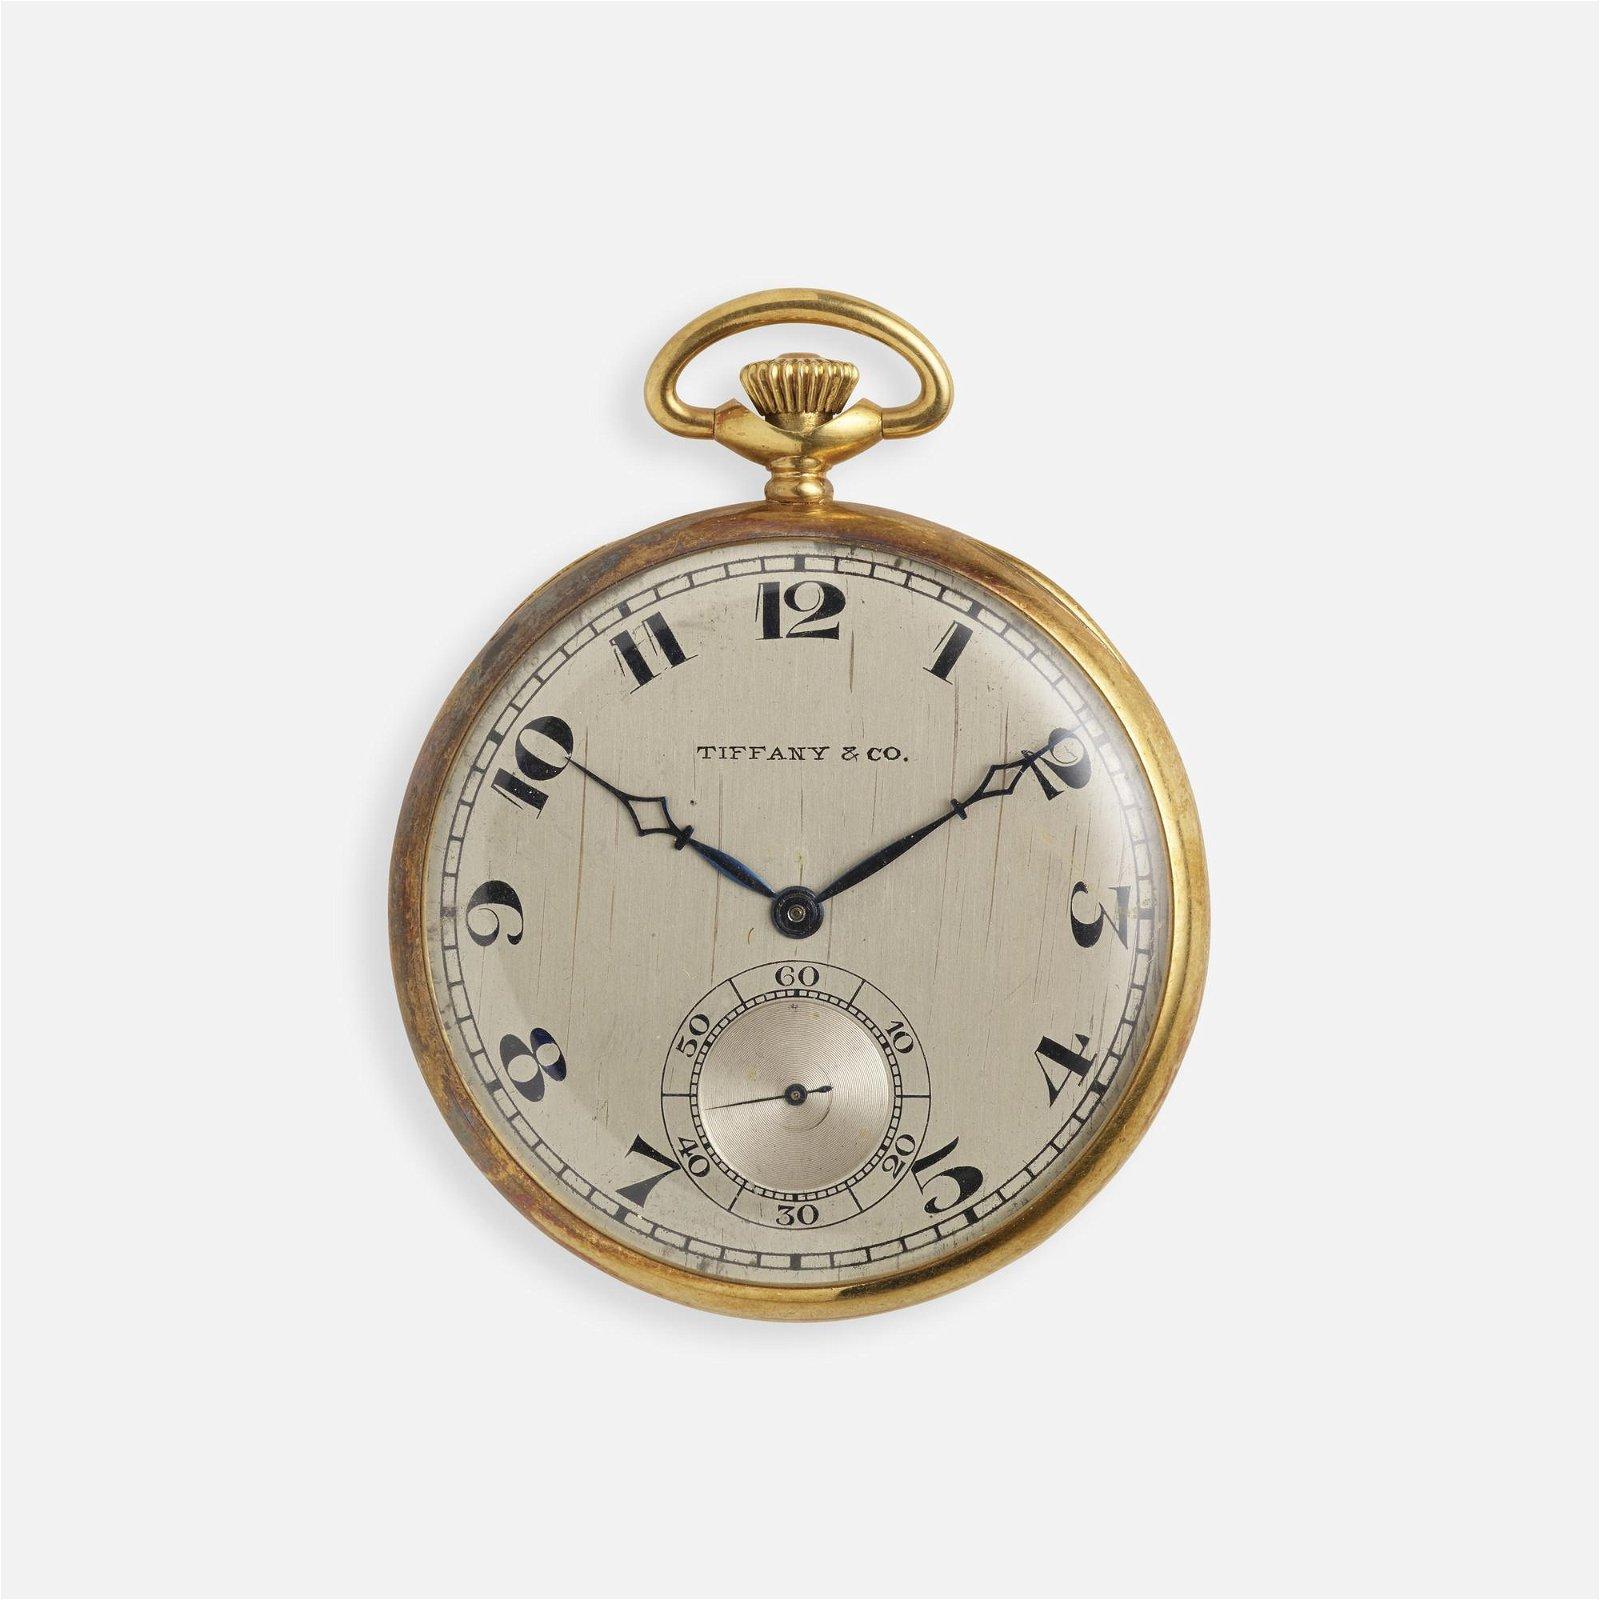 Tiffany & Co., Gold pocket watch